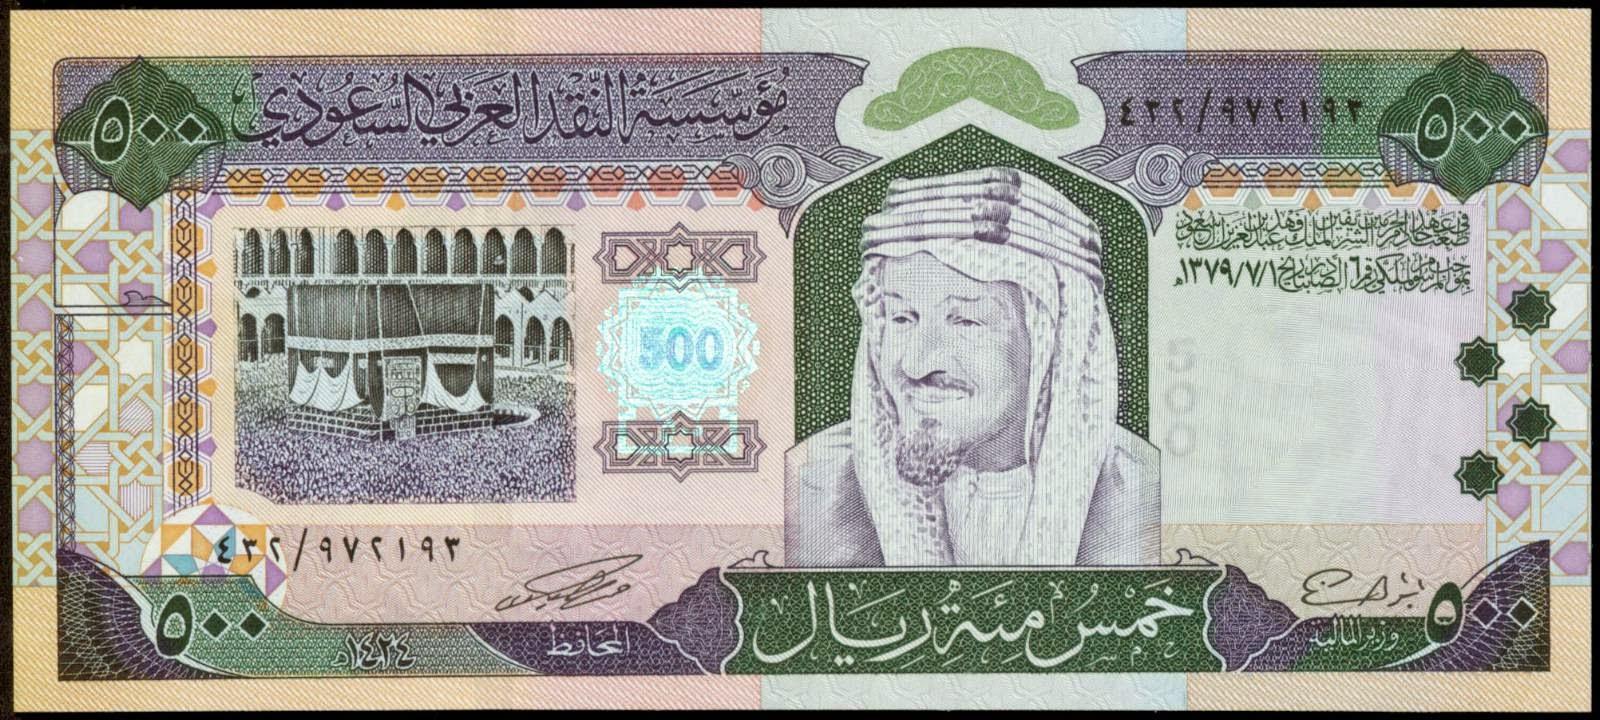 Saudi Arabia banknotes 500 Saudi Riyals note 2003 King Abdul-Aziz